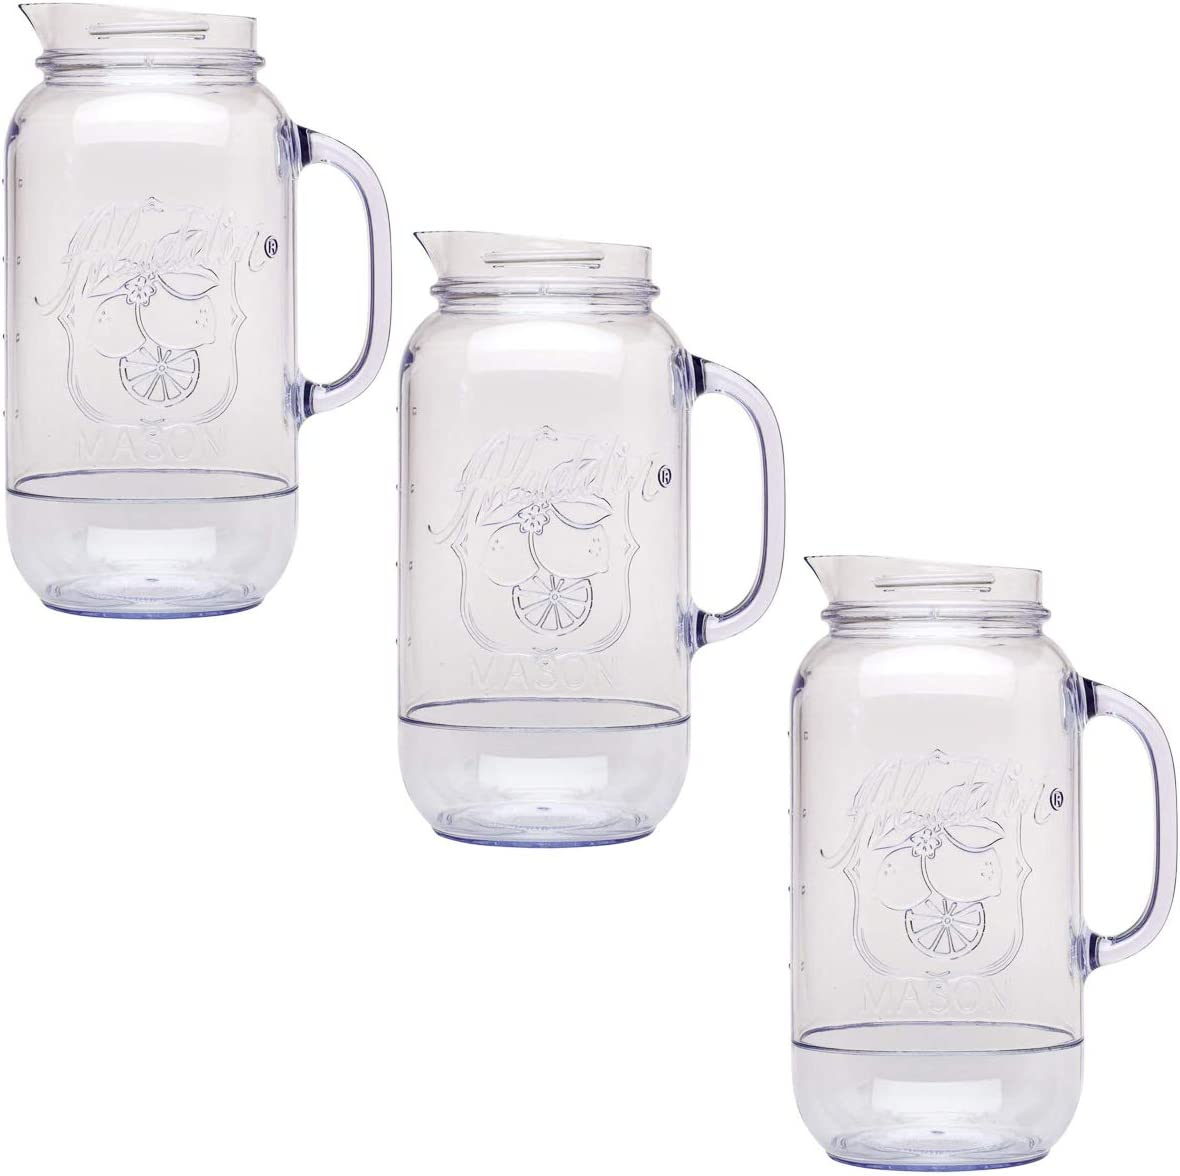 Aladdin (3 Pack) Mason Jar Pitcher, Carafe Set 2.5 Quart For Water Pitcher, Iced Tea Pitcher, Juice Pitcher, Lemonade Pitcher, Picnic, BBQ